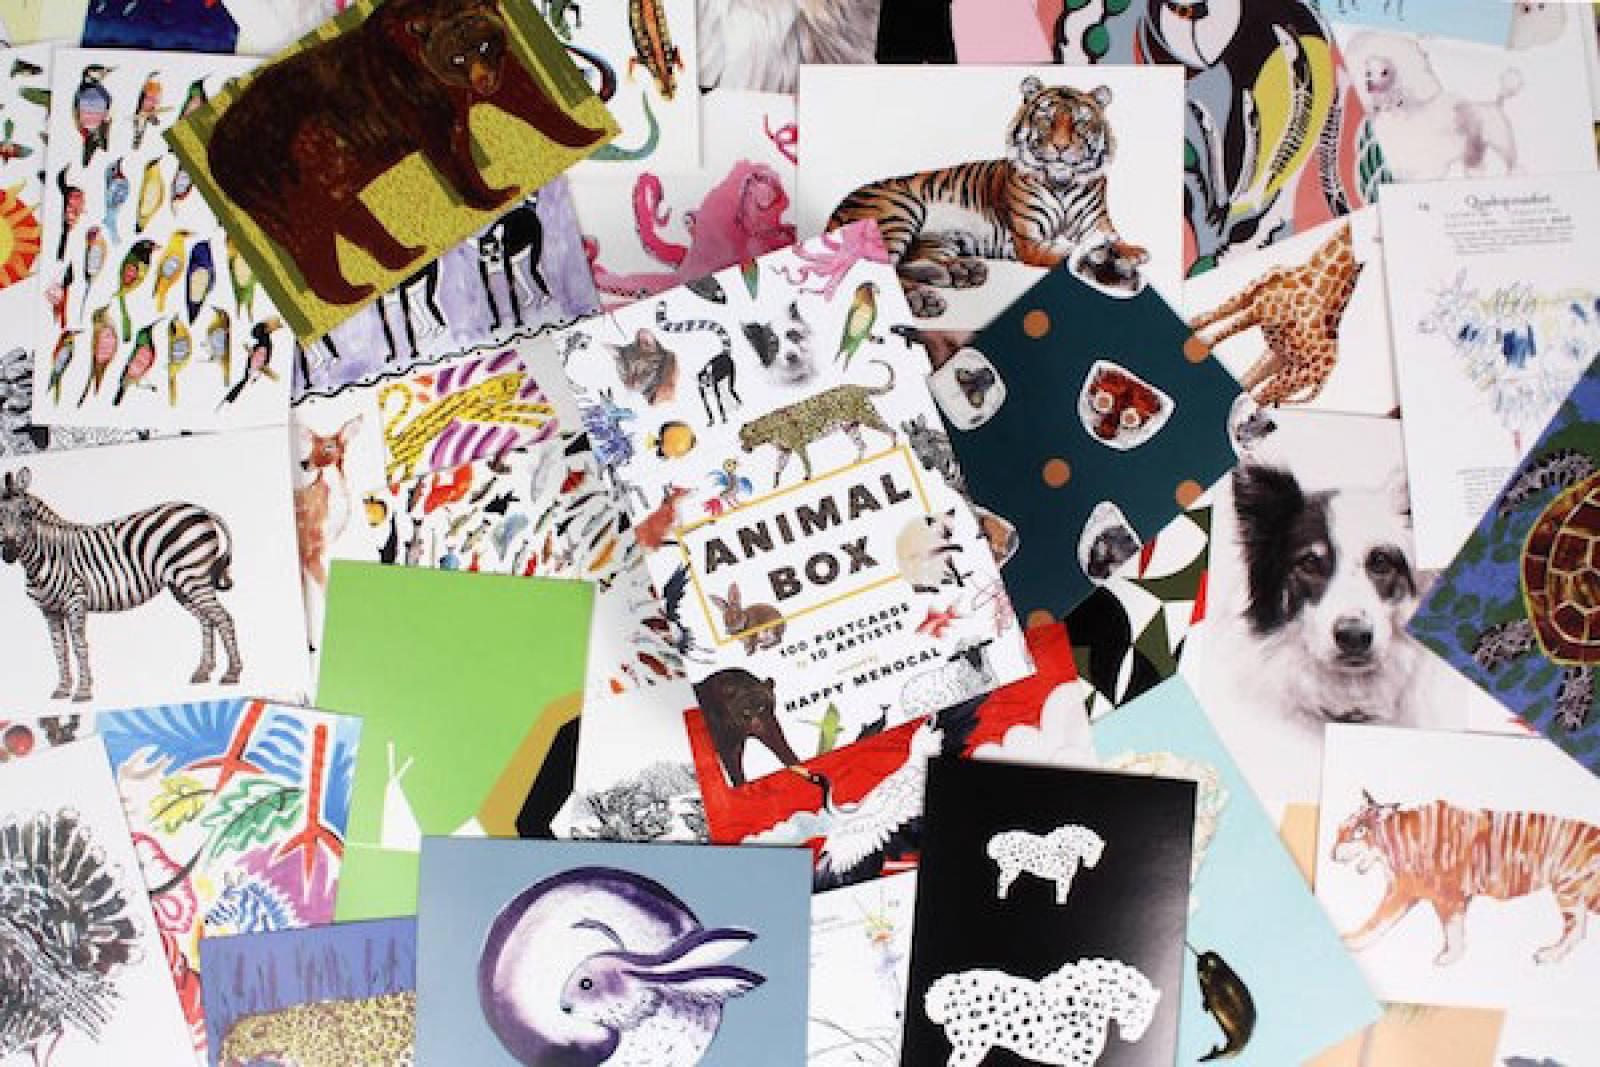 Animal Box - 100 Postcards Boxed Set thumbnails